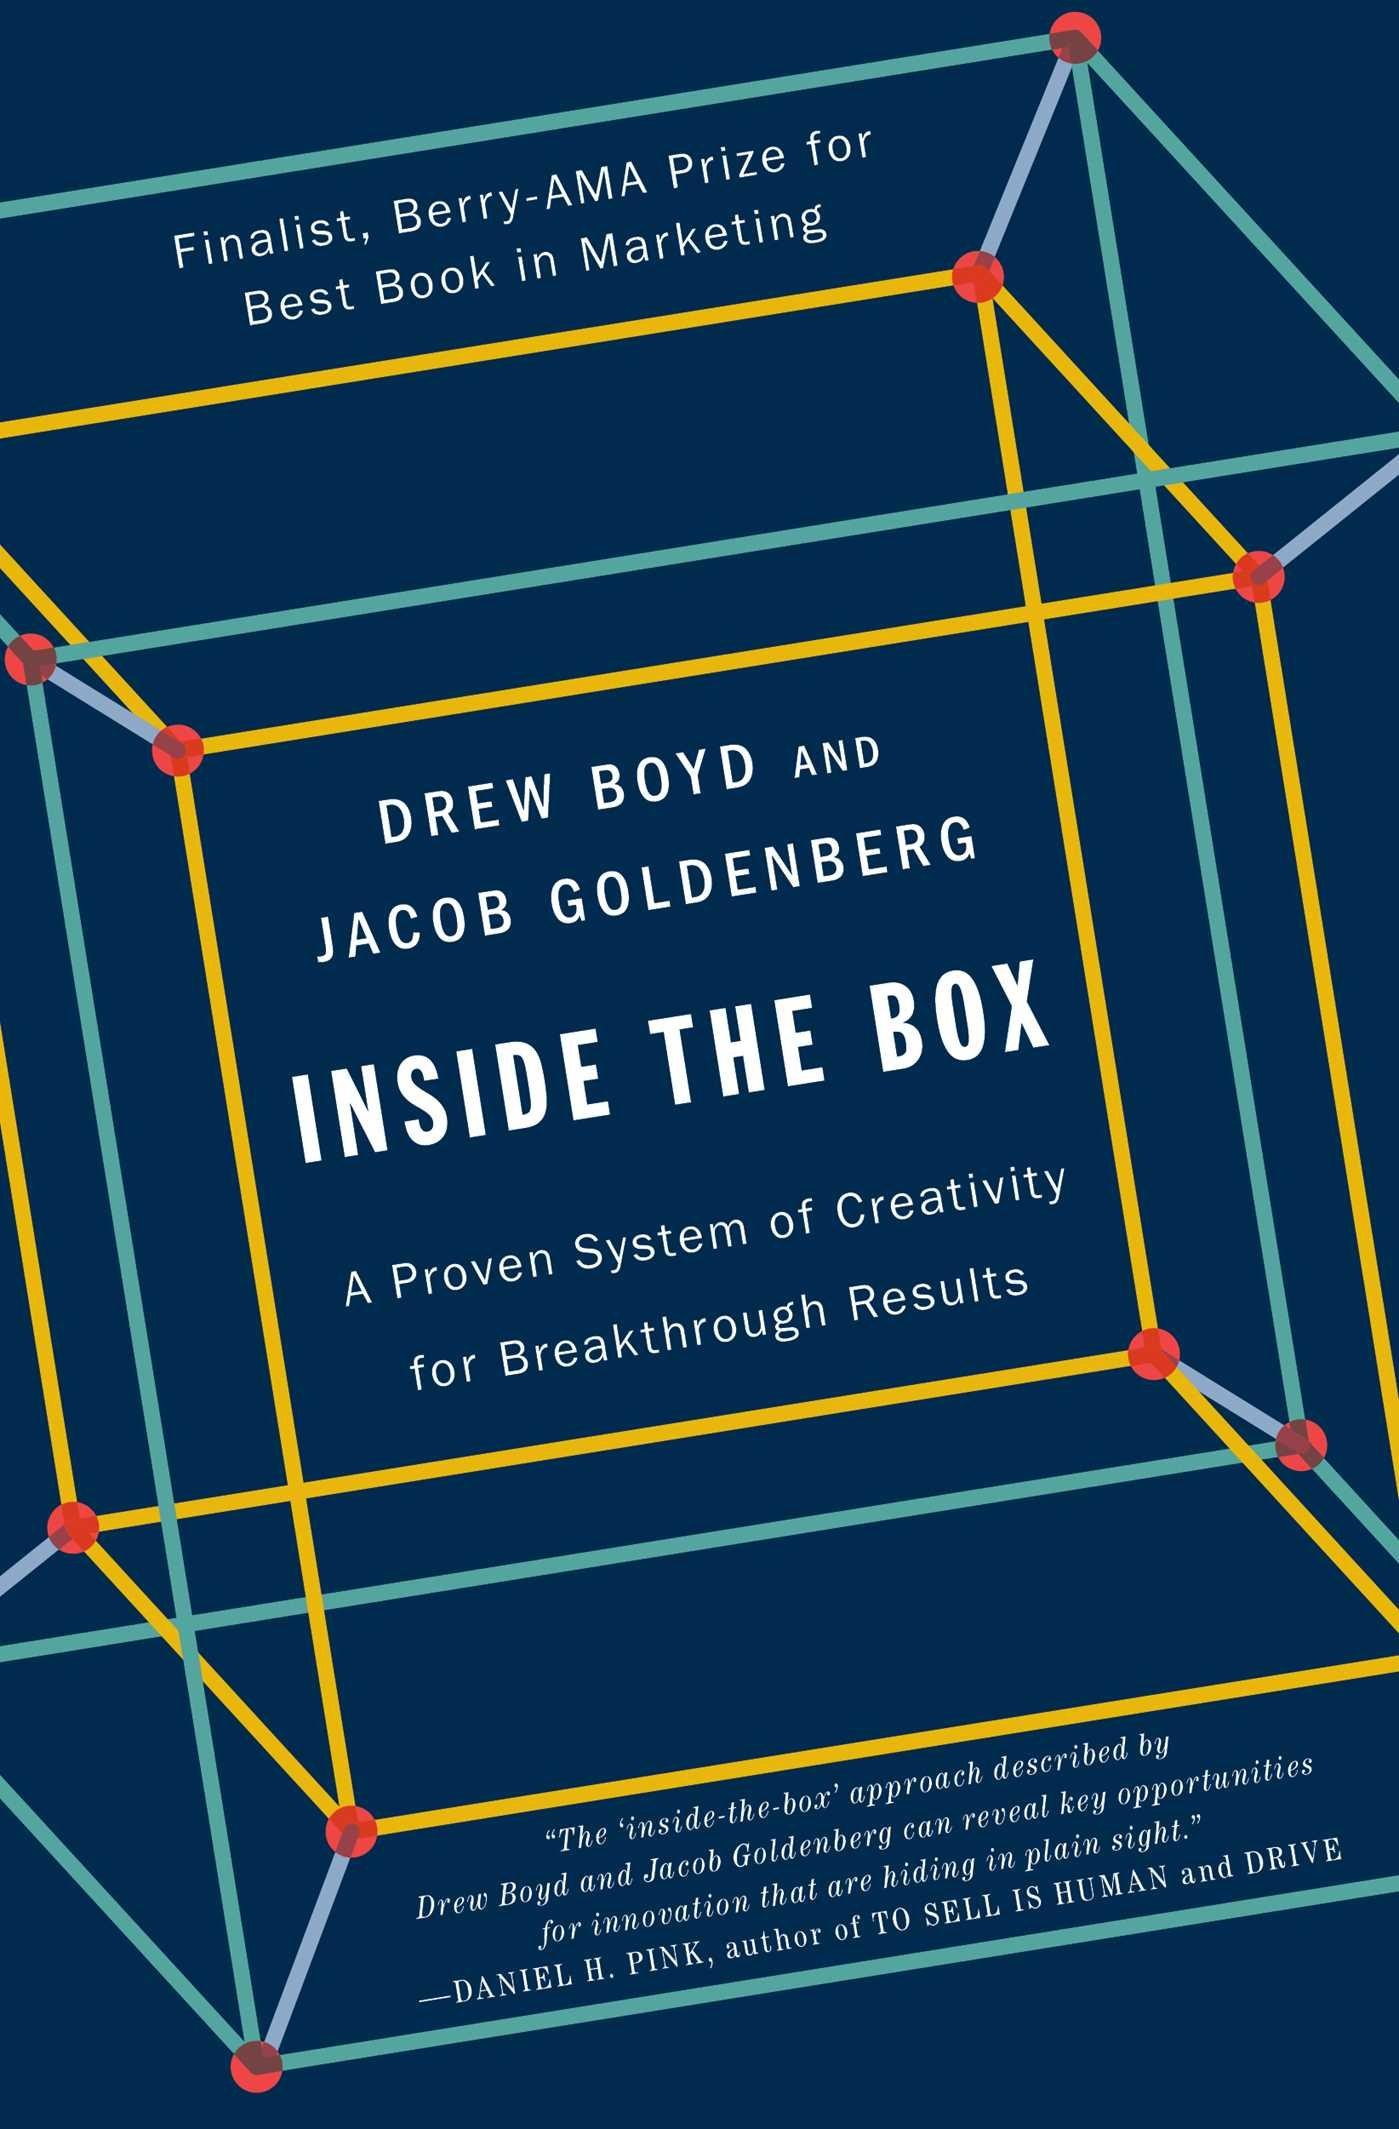 inside the box a proven system of creativity for breakthrough inside the box a proven system of creativity for breakthrough results drew boyd jacob goldenberg 9781451659290 amazon com books